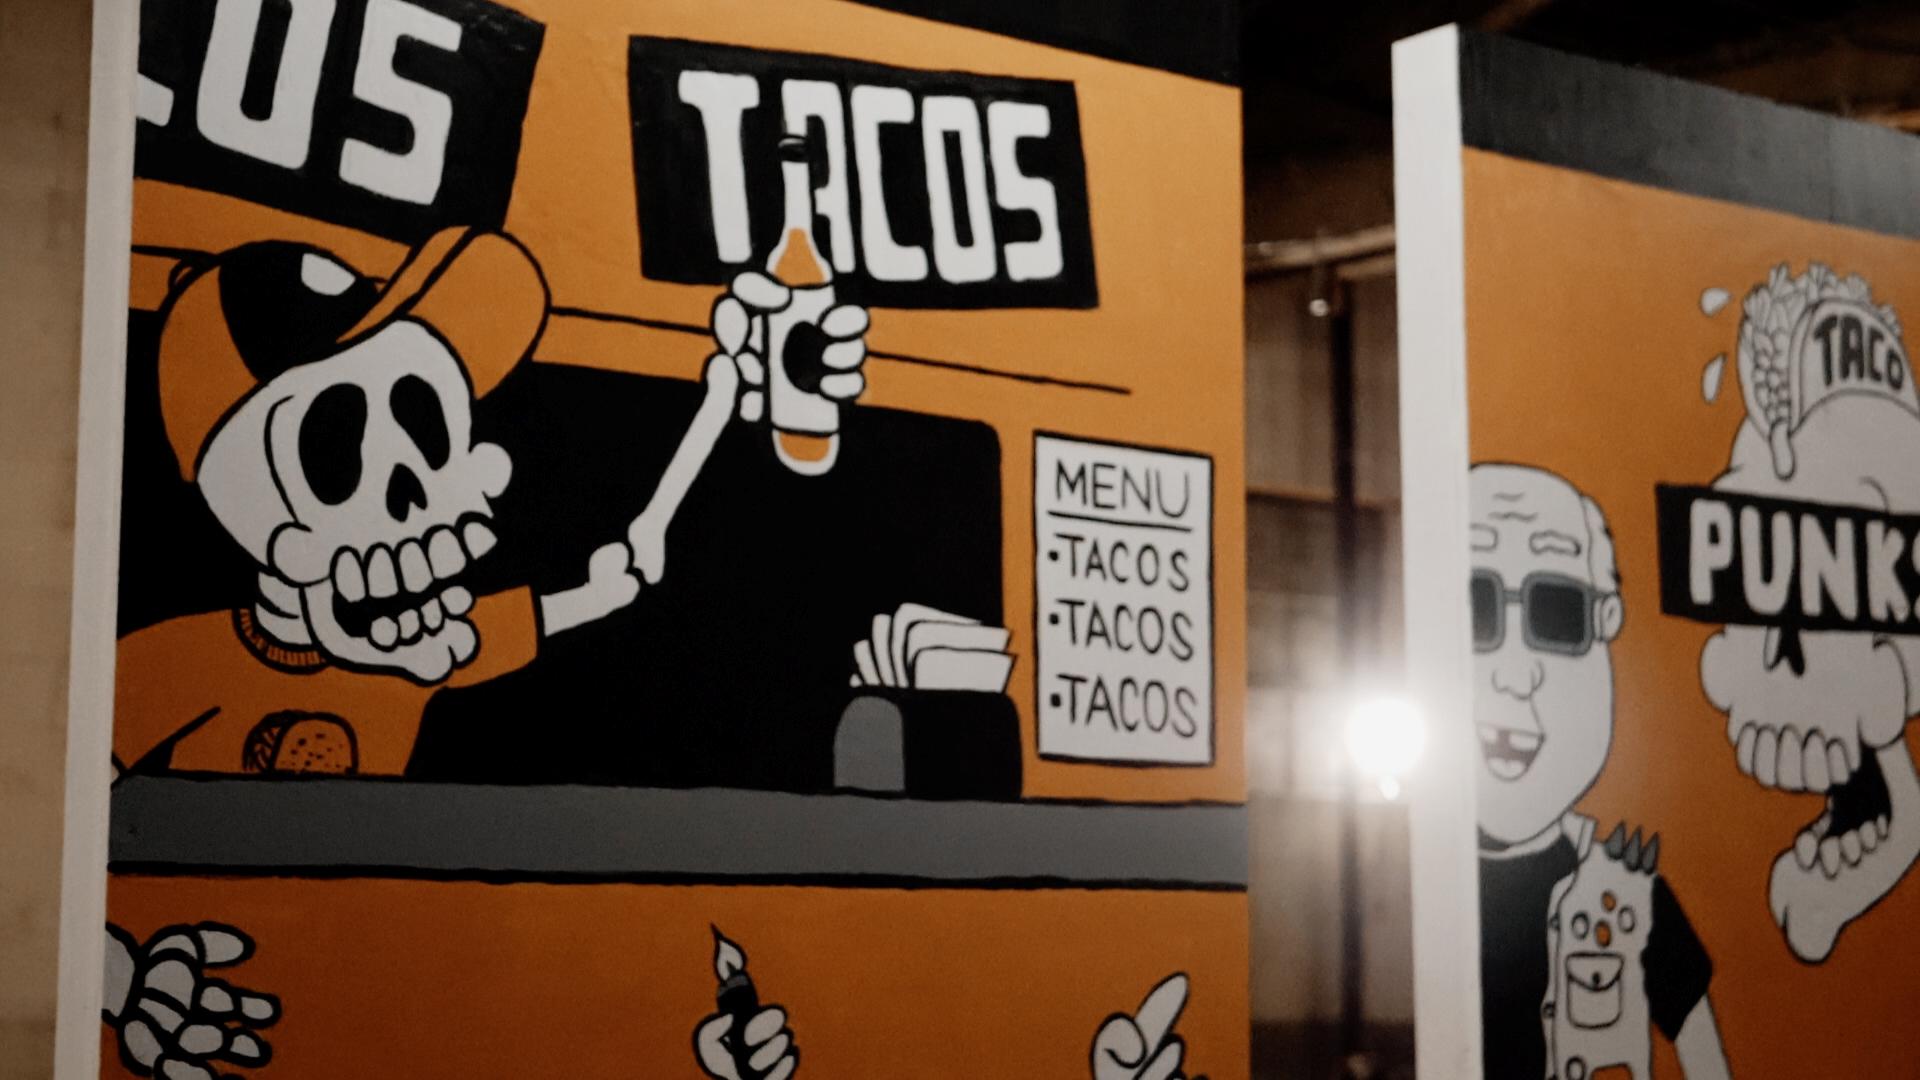 Punk-Taco-Pic9.jpg